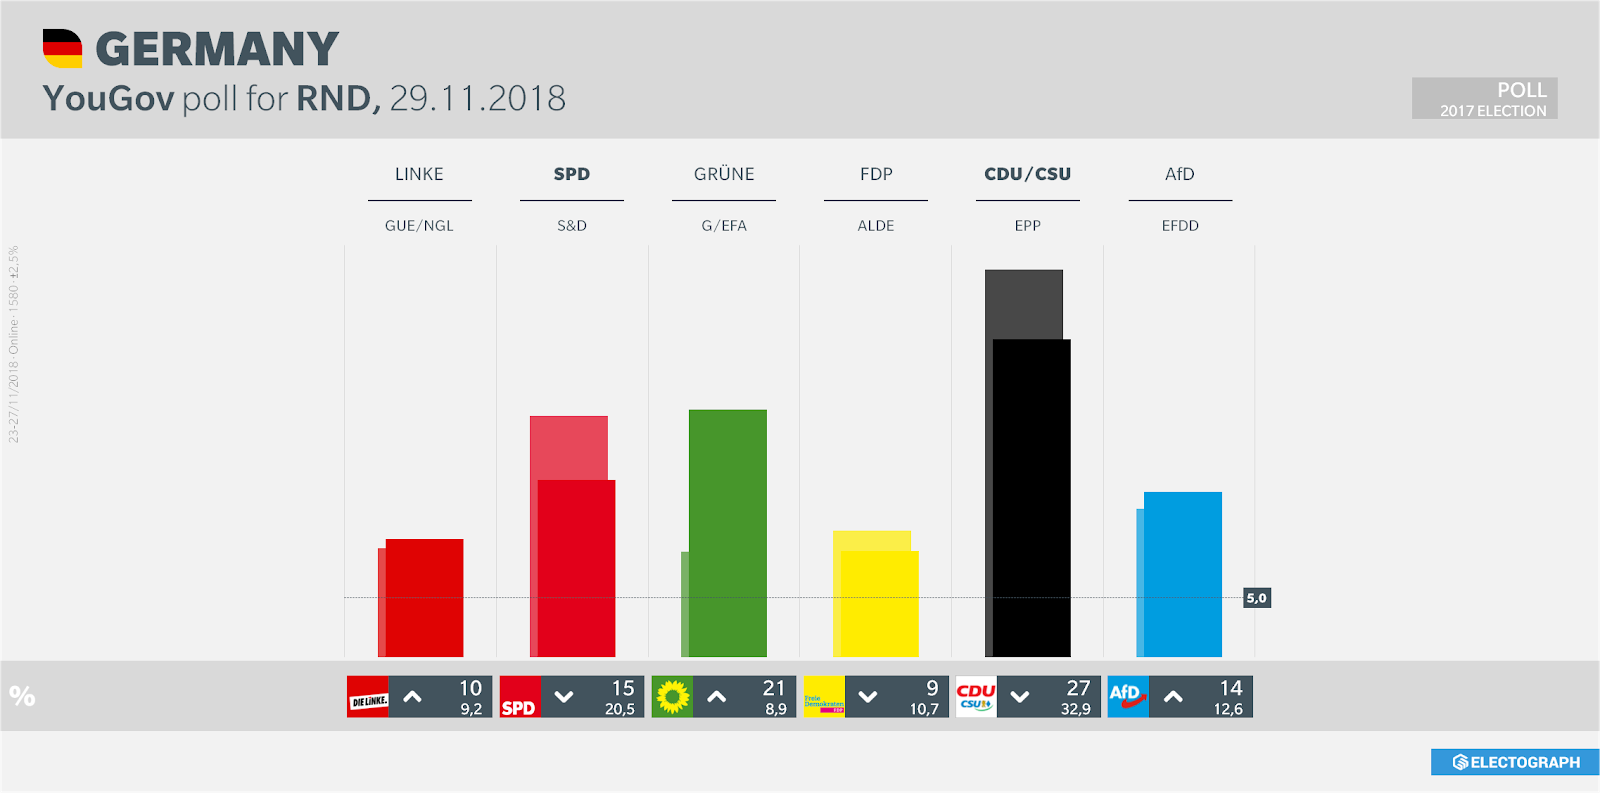 GERMANY: YouGov poll chart for RND, 29 November 2018